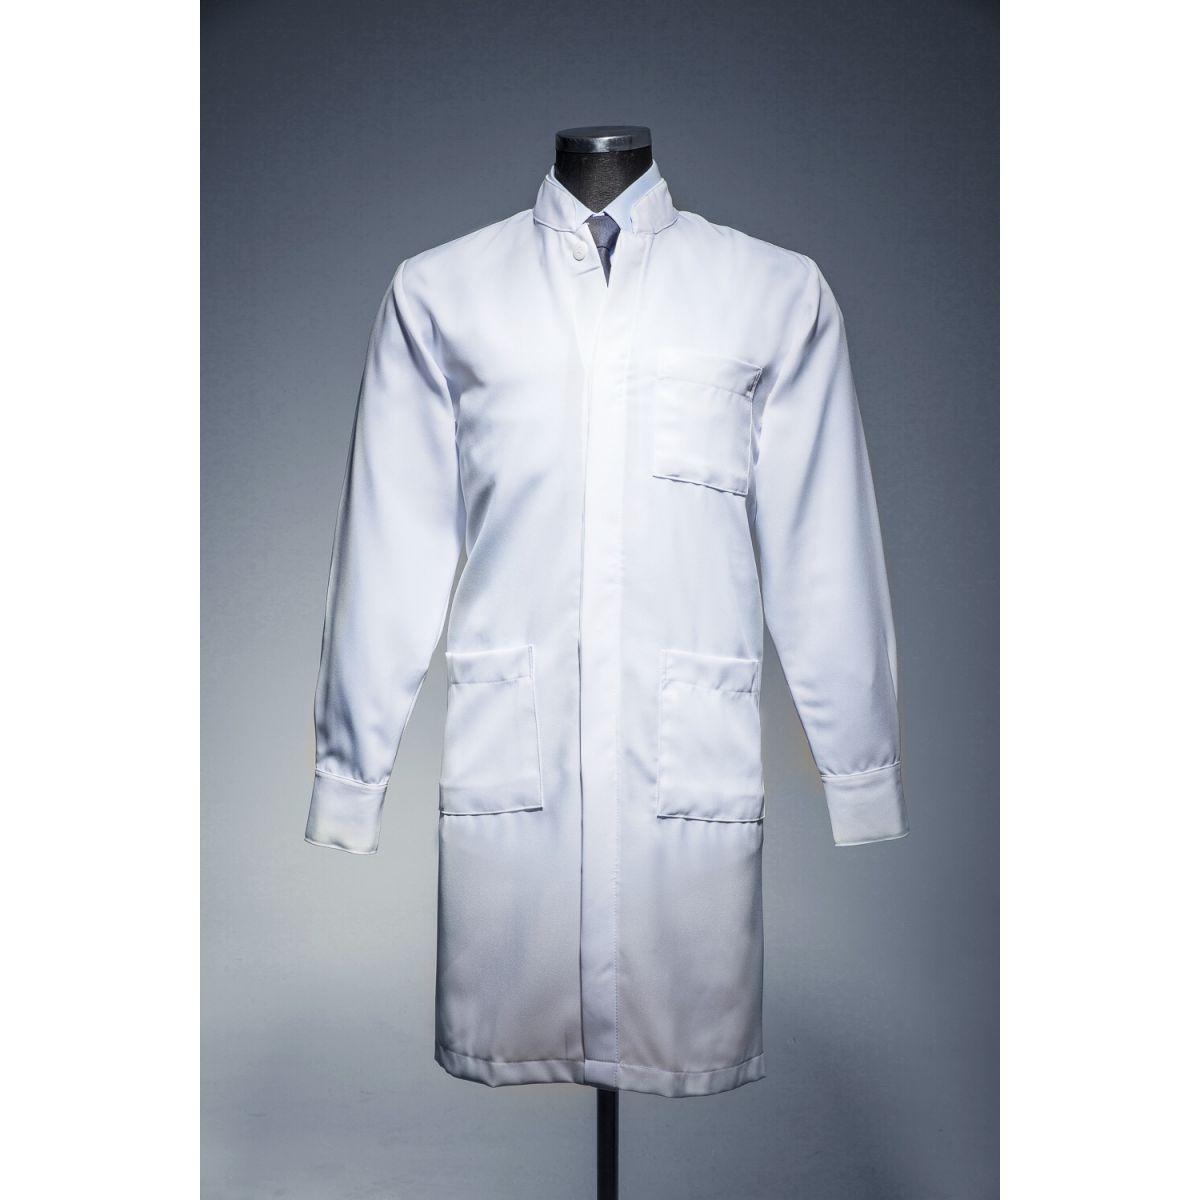 Jaleco Gola de Padre Punho Camisa Masculino Oxford 100%Poliéster